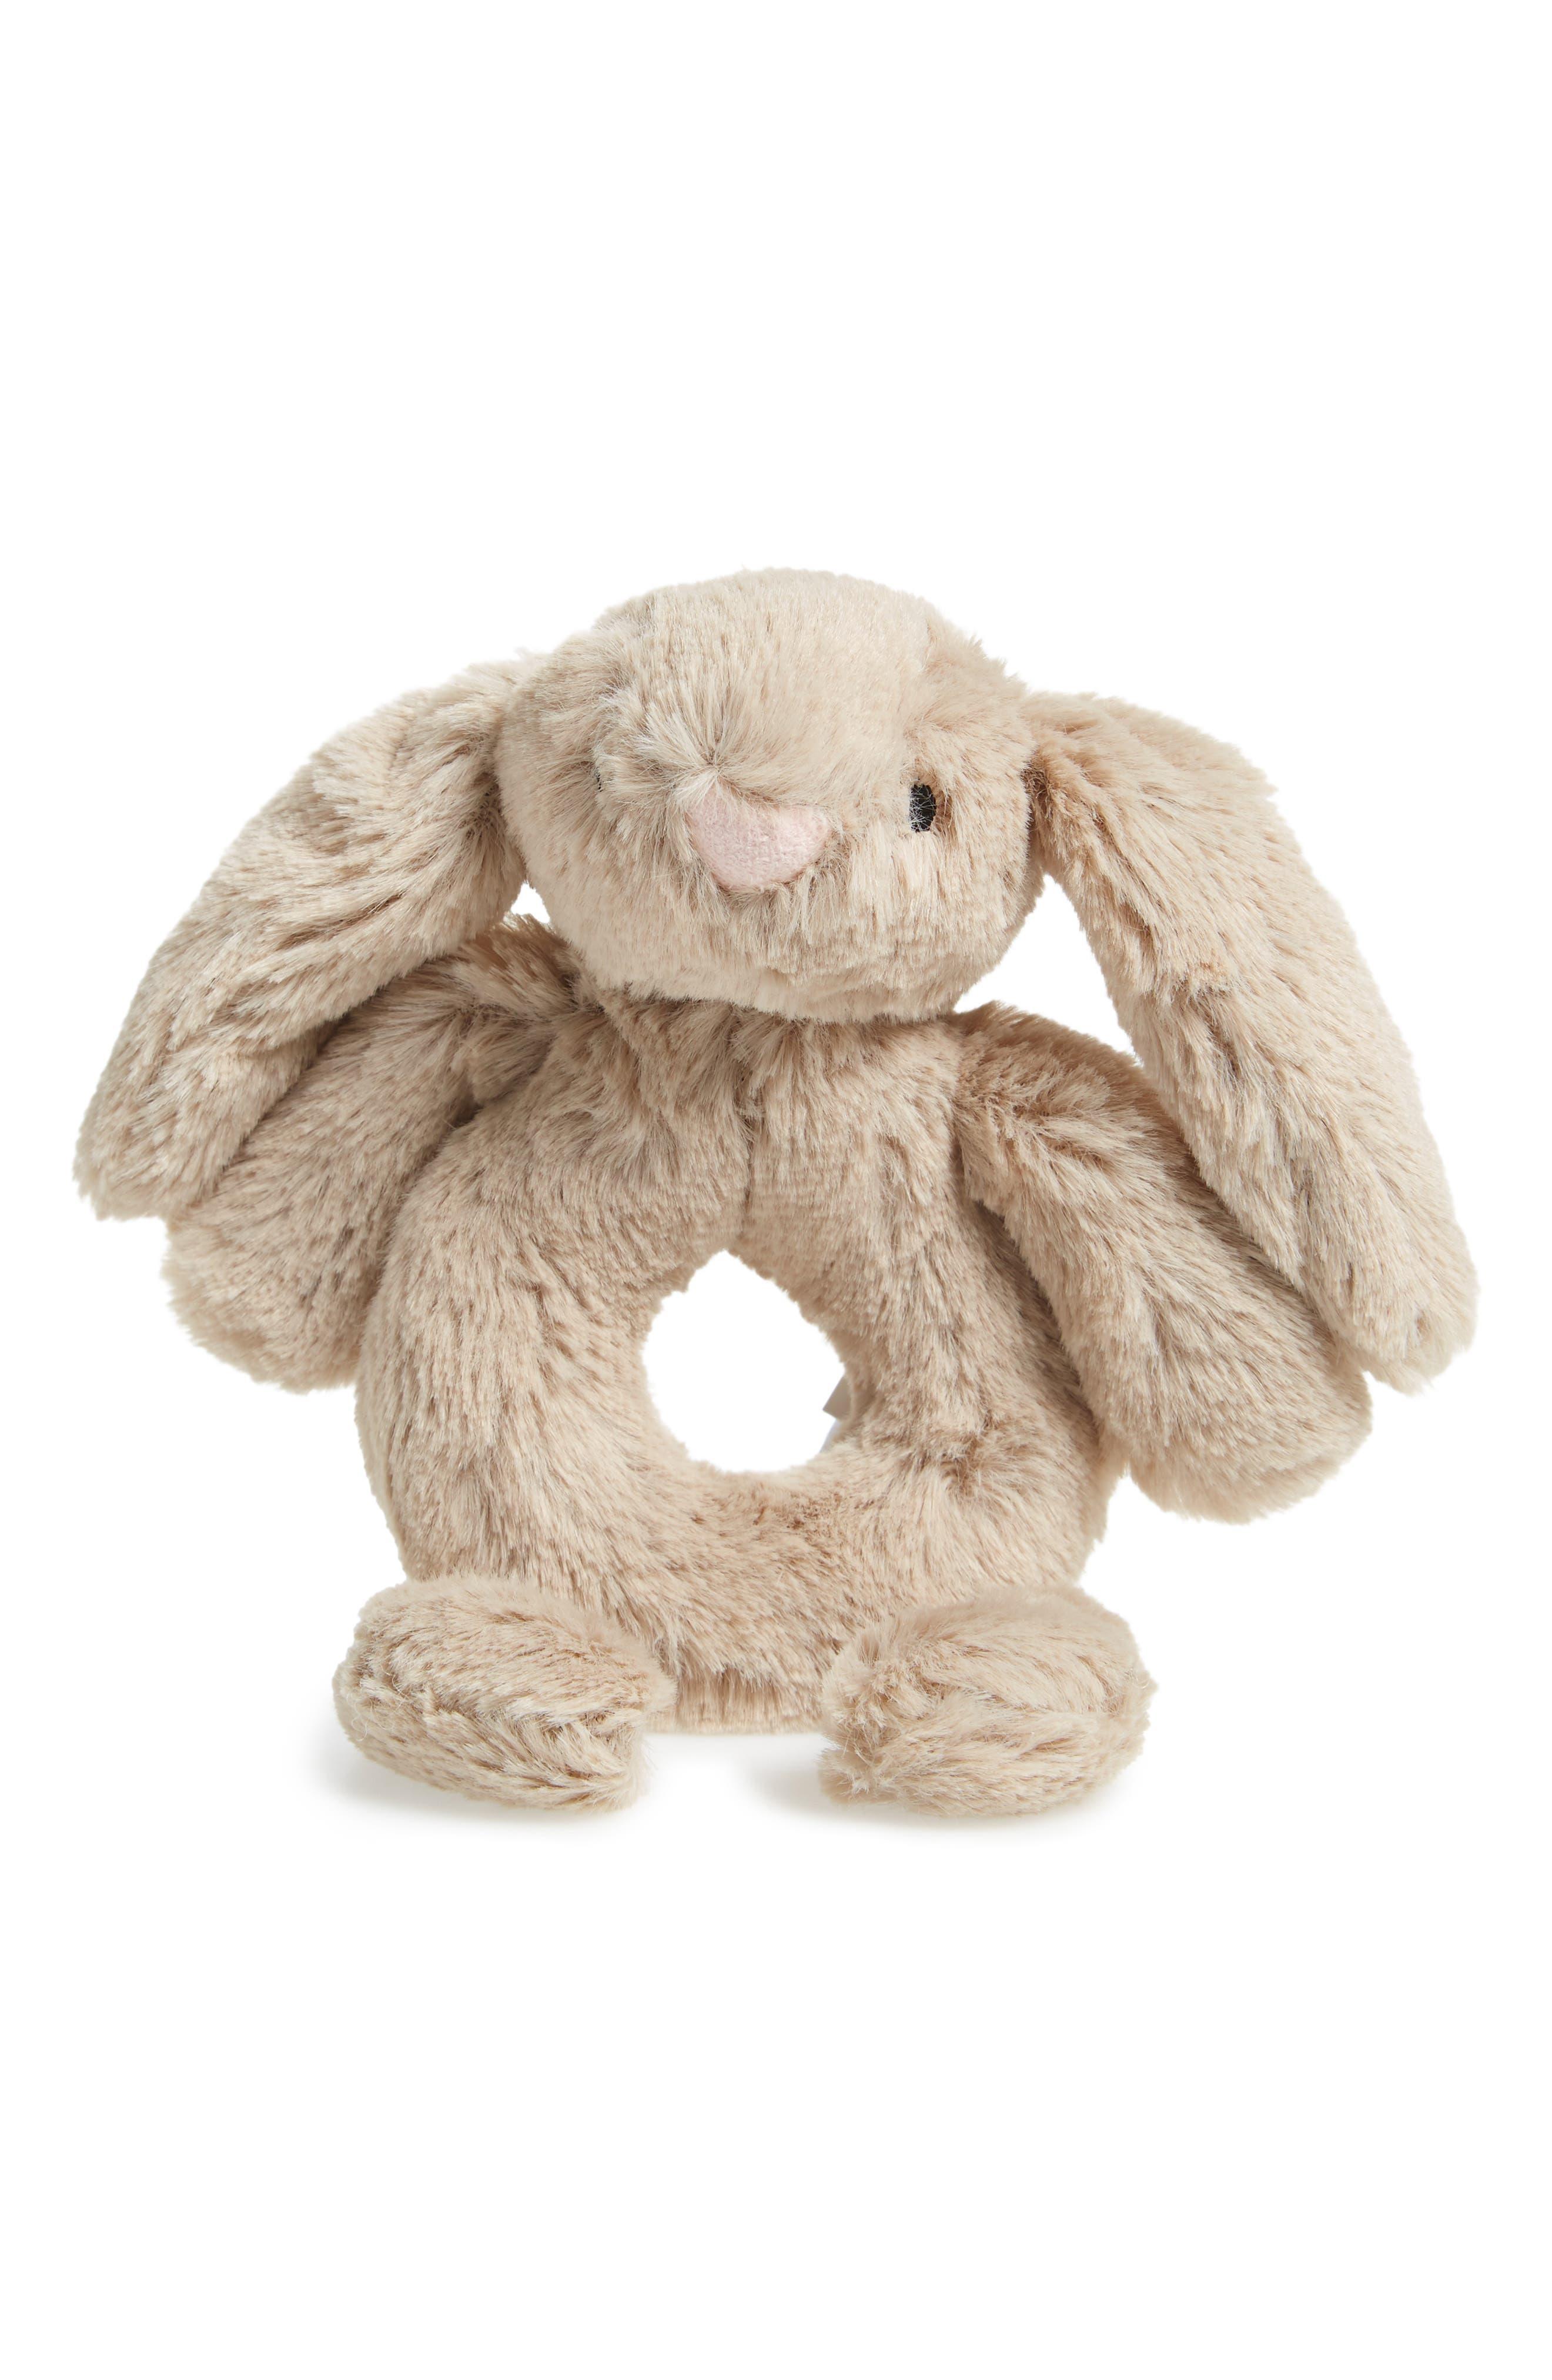 Alternate Image 1 Selected - Jellycat 'Bashful Bunny' Grabber Rattle